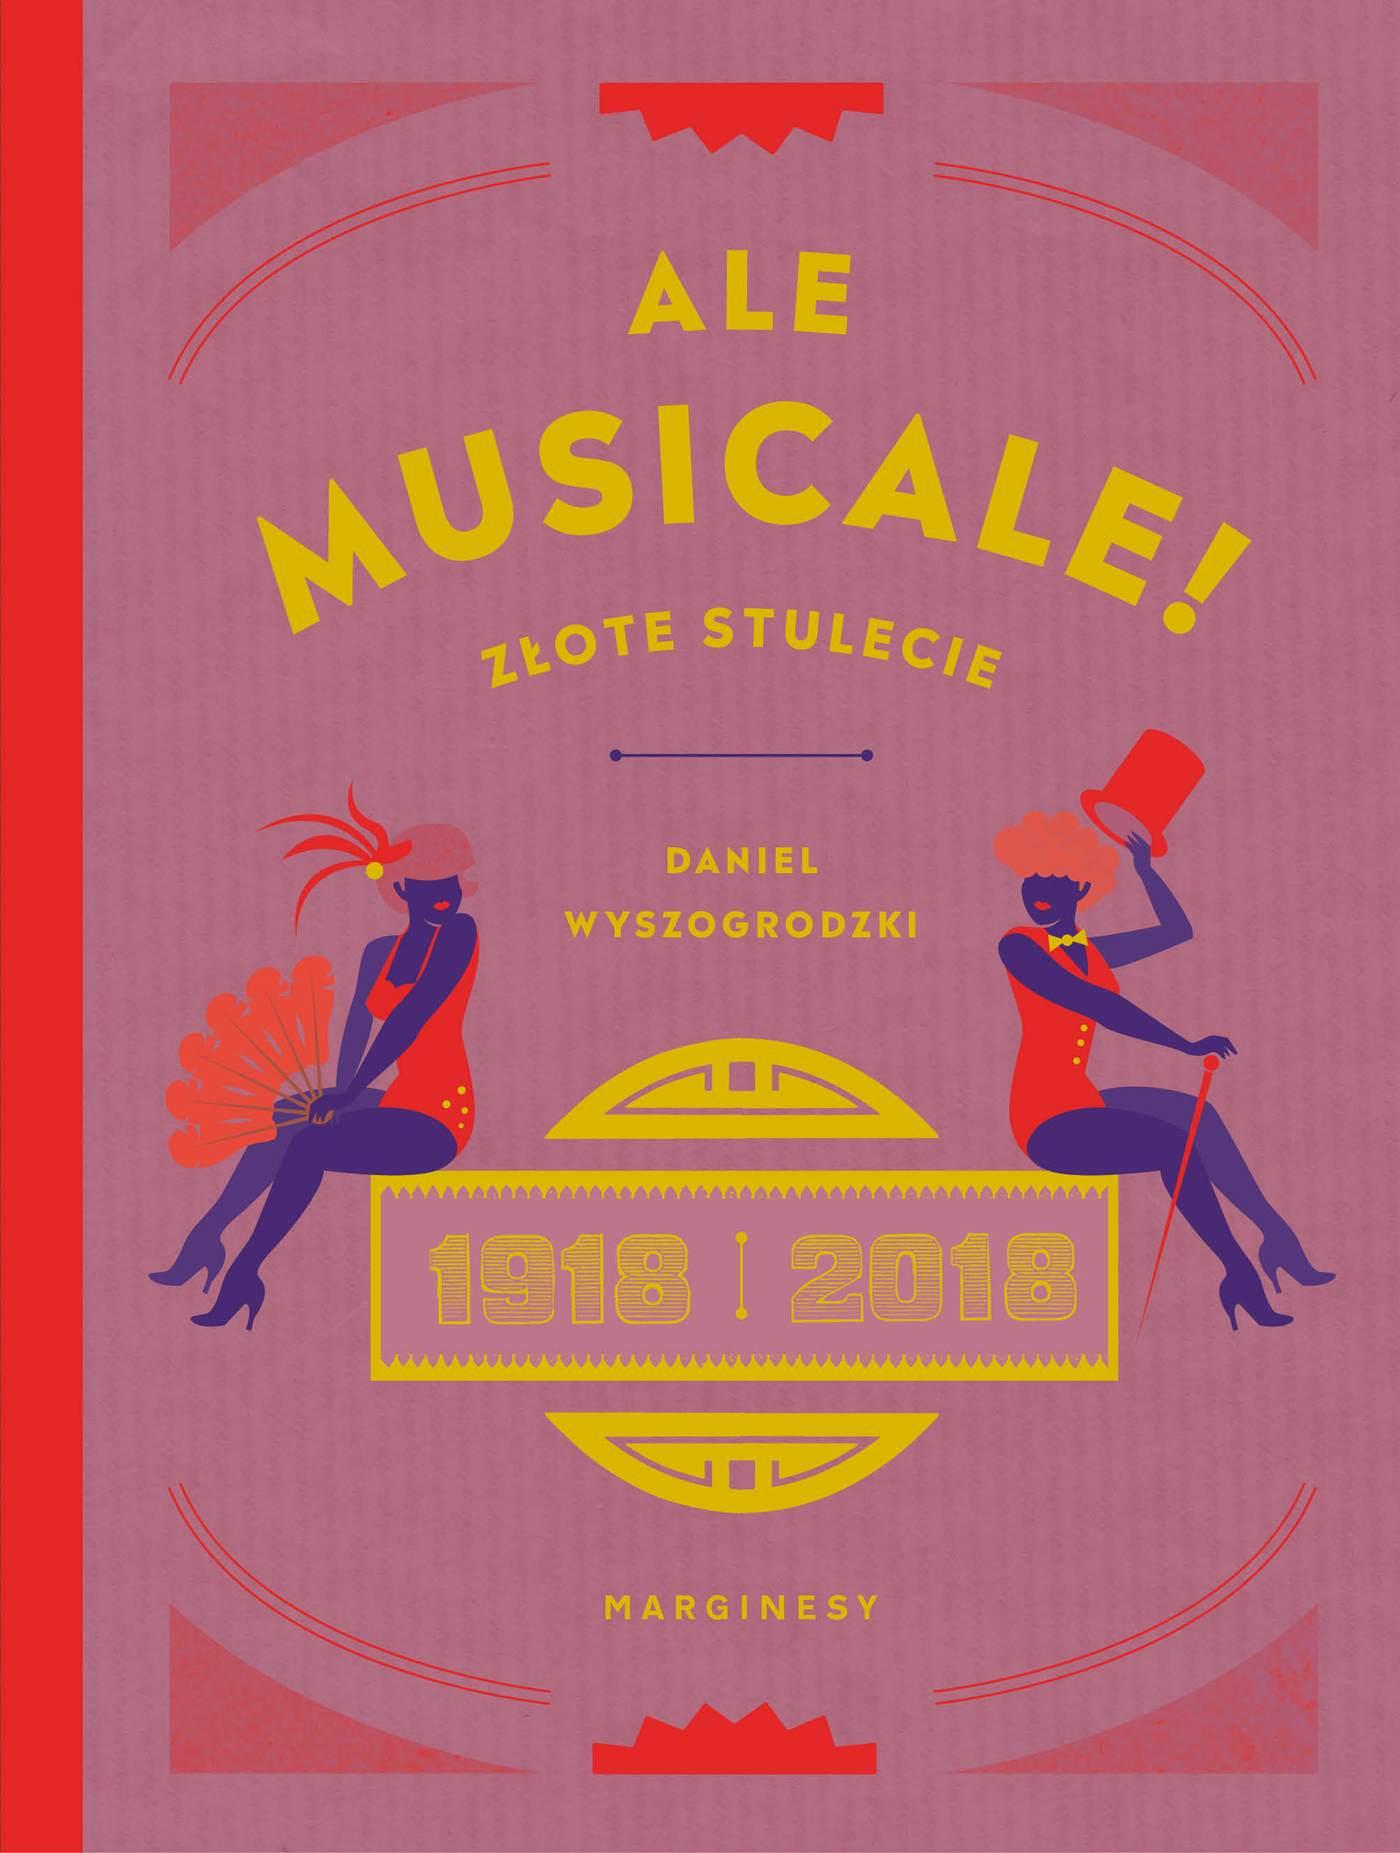 Ale musicale! - Ebook (Książka EPUB) do pobrania w formacie EPUB